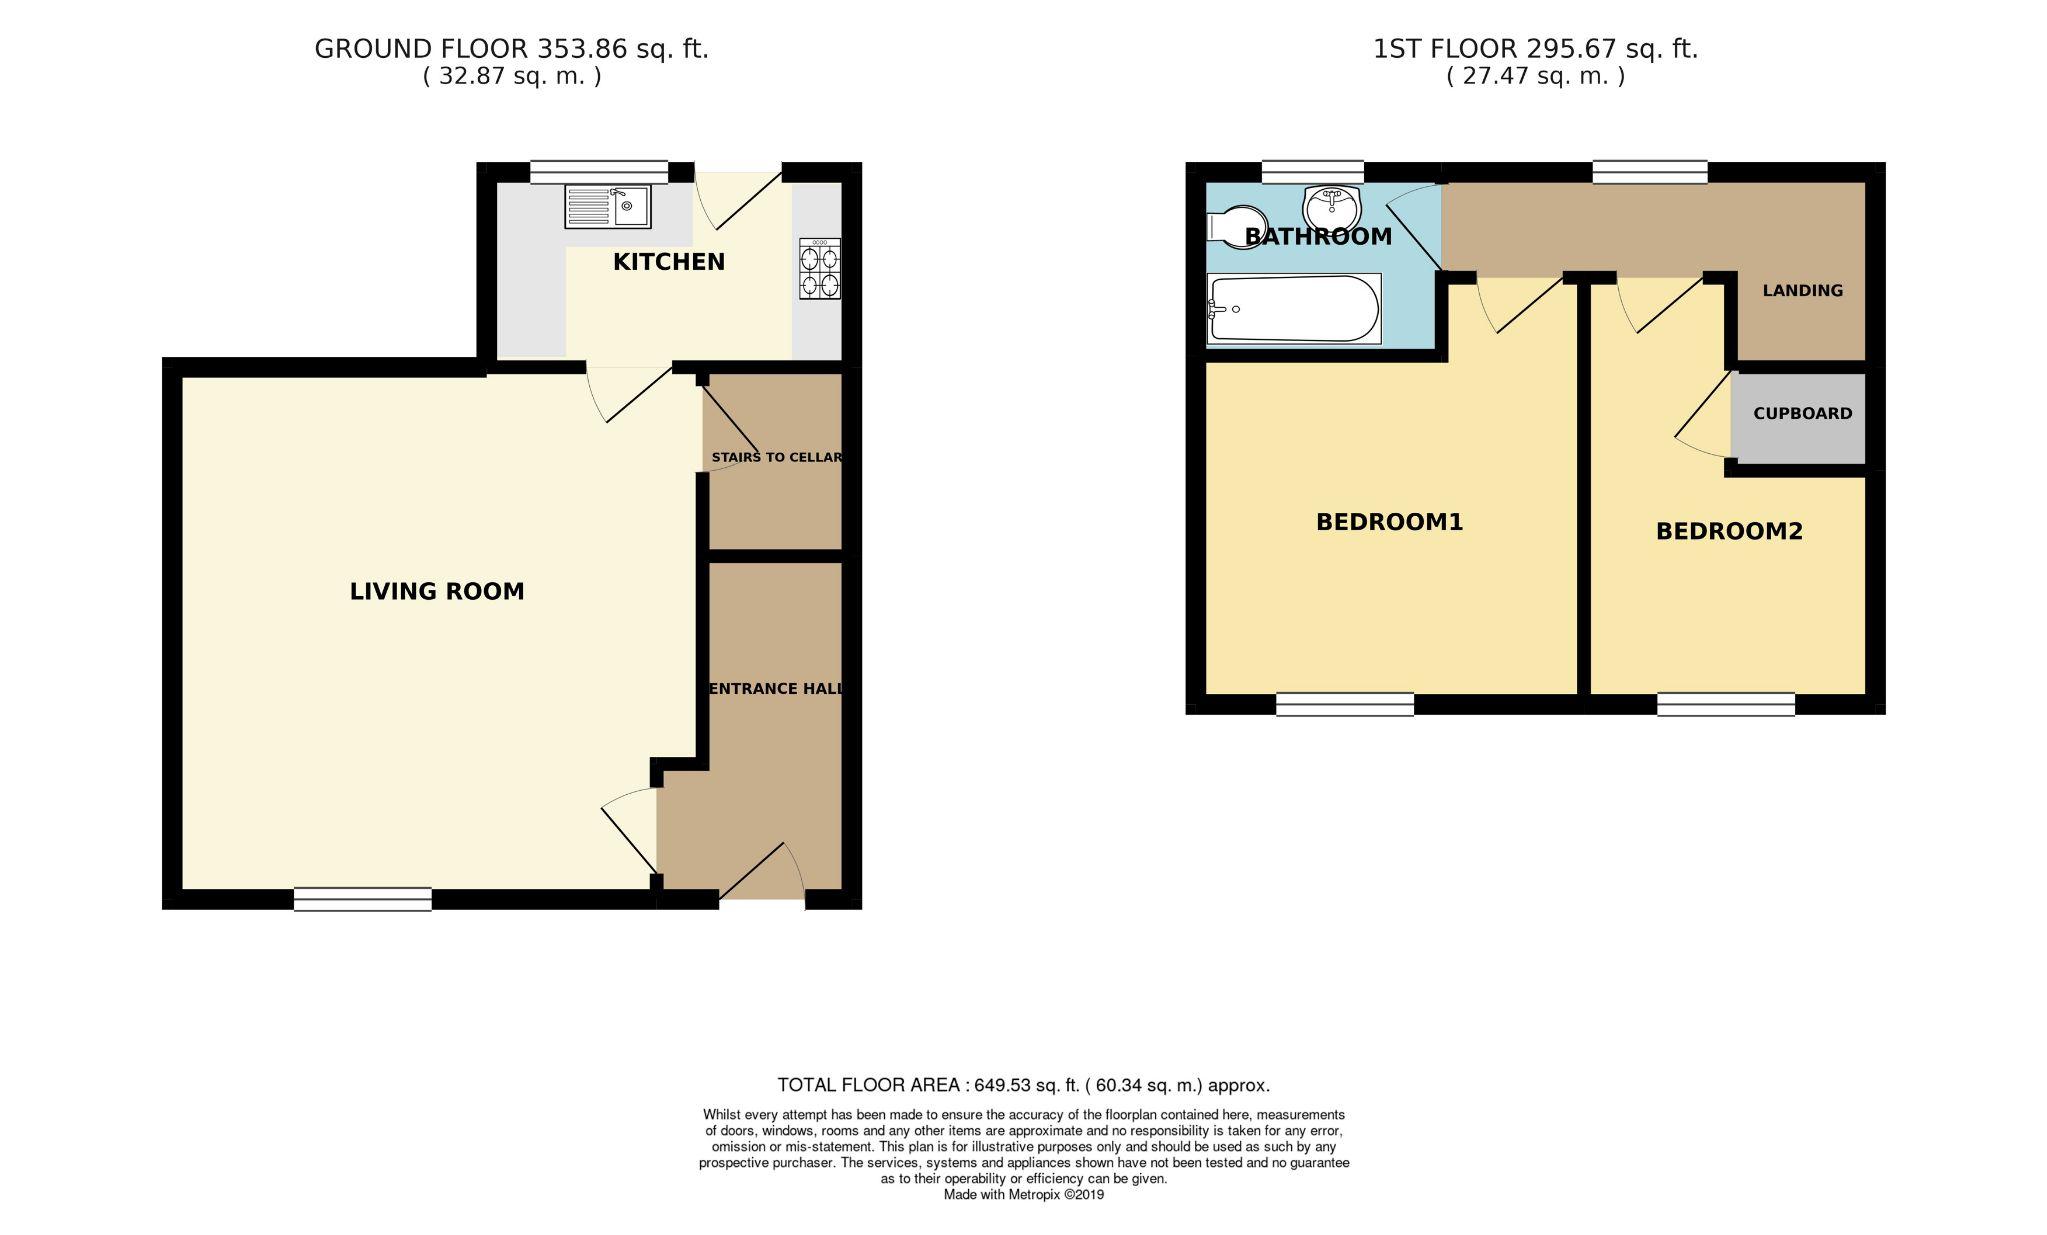 2 bedroom cottage house SSTC in Huddersfield - Floorplan 1